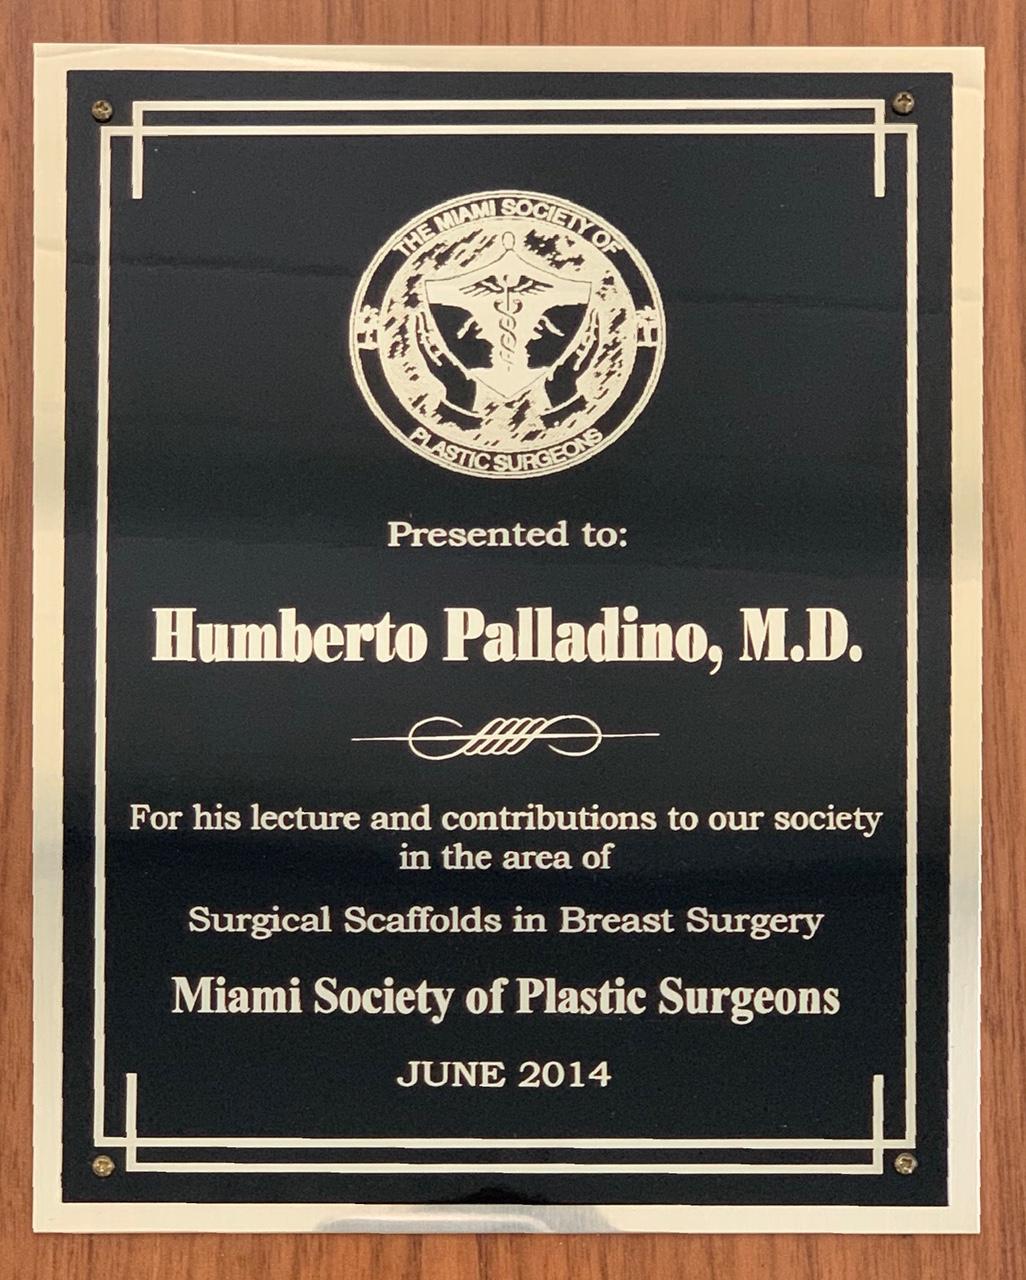 Miami Society of Plastic Surgeons